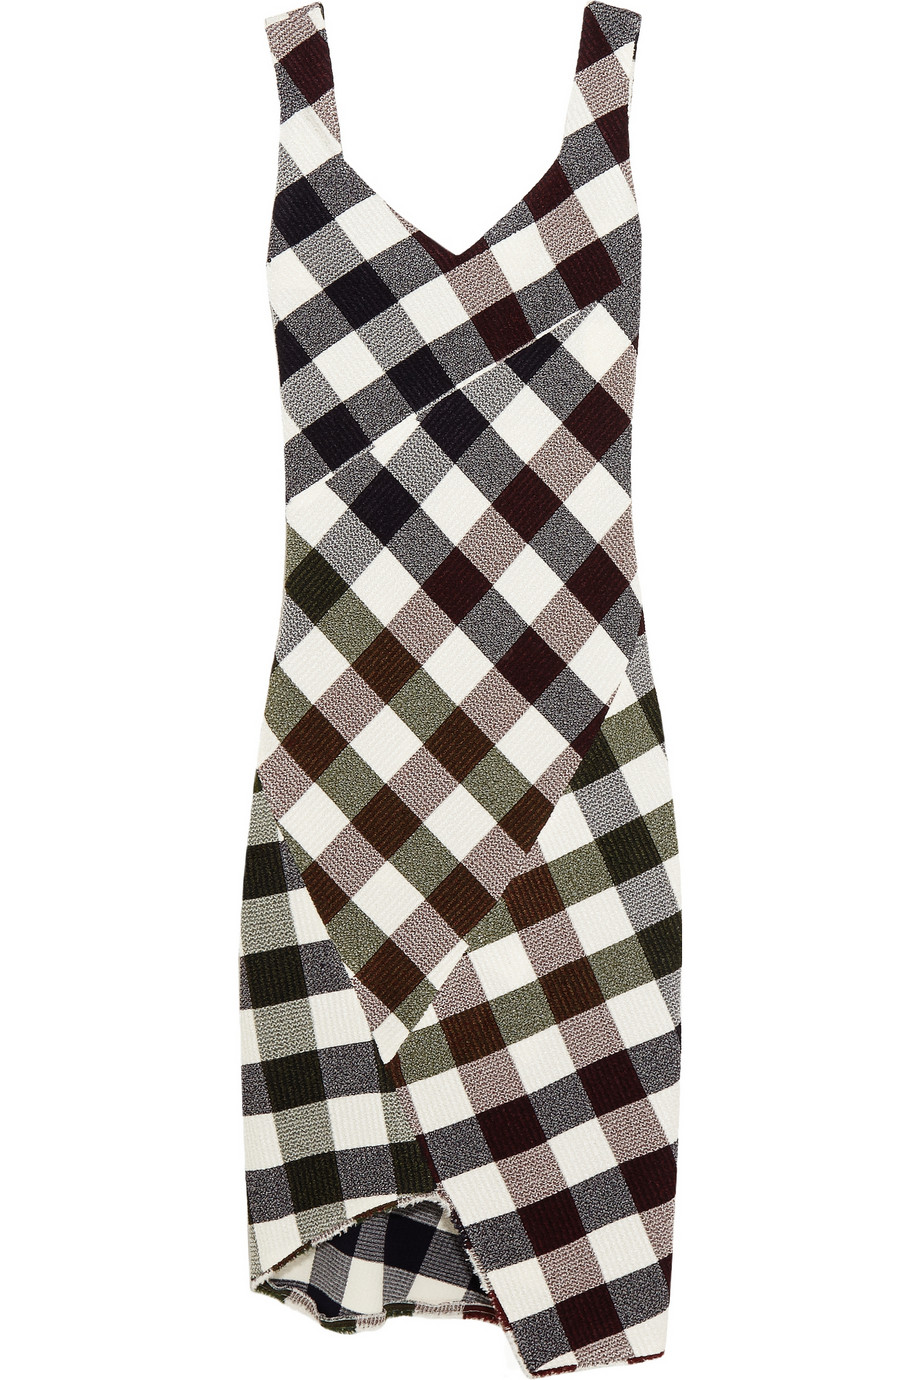 VICTORIA BECKHAM Gingham stretch-knit dress